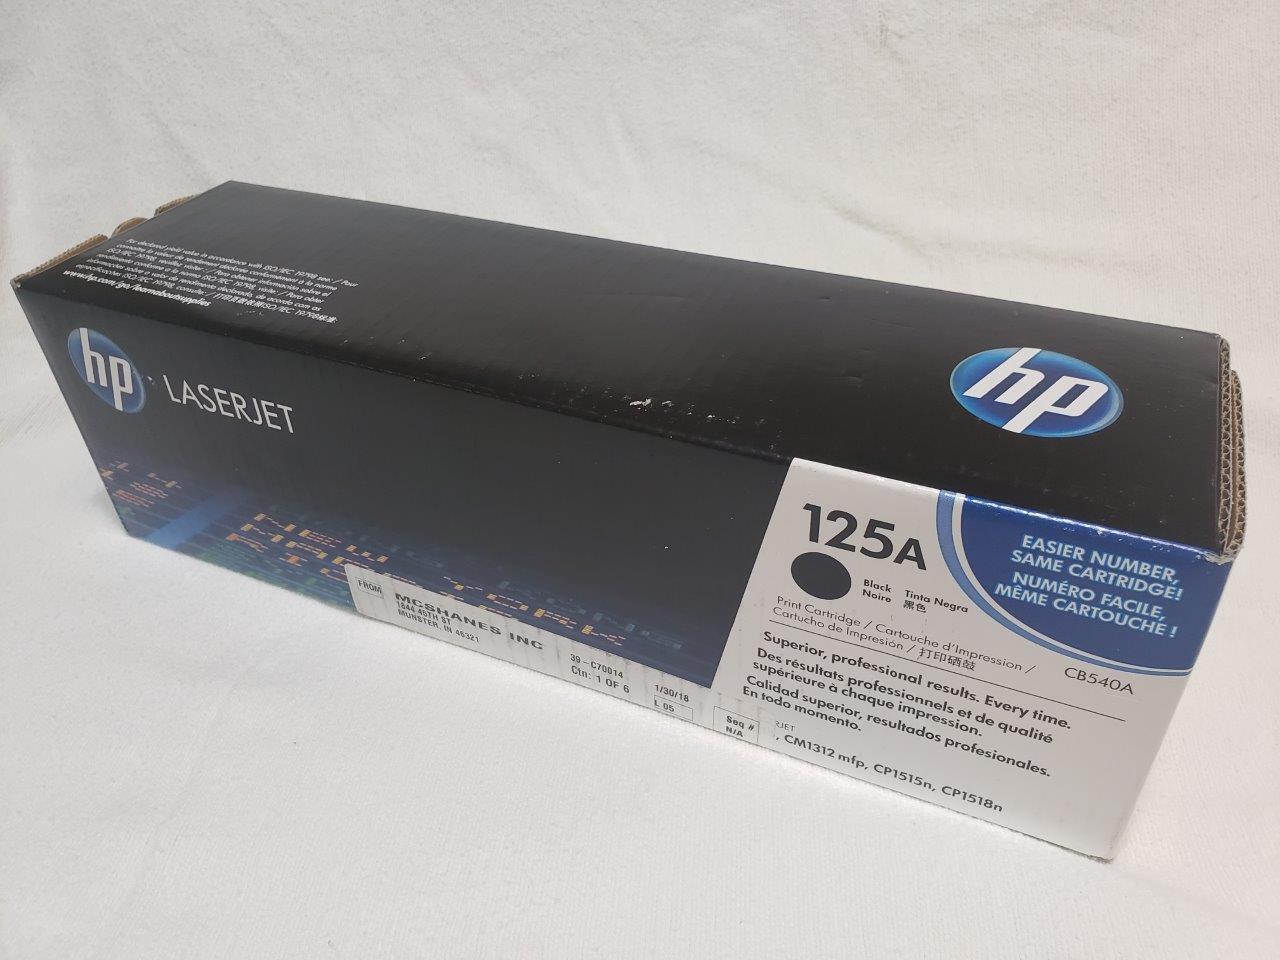 HP 125A Black Original LaserJet Toner Cartridge, CB540A Genuine Sealed for CM1312nfi CP1215 CP1518ni printers